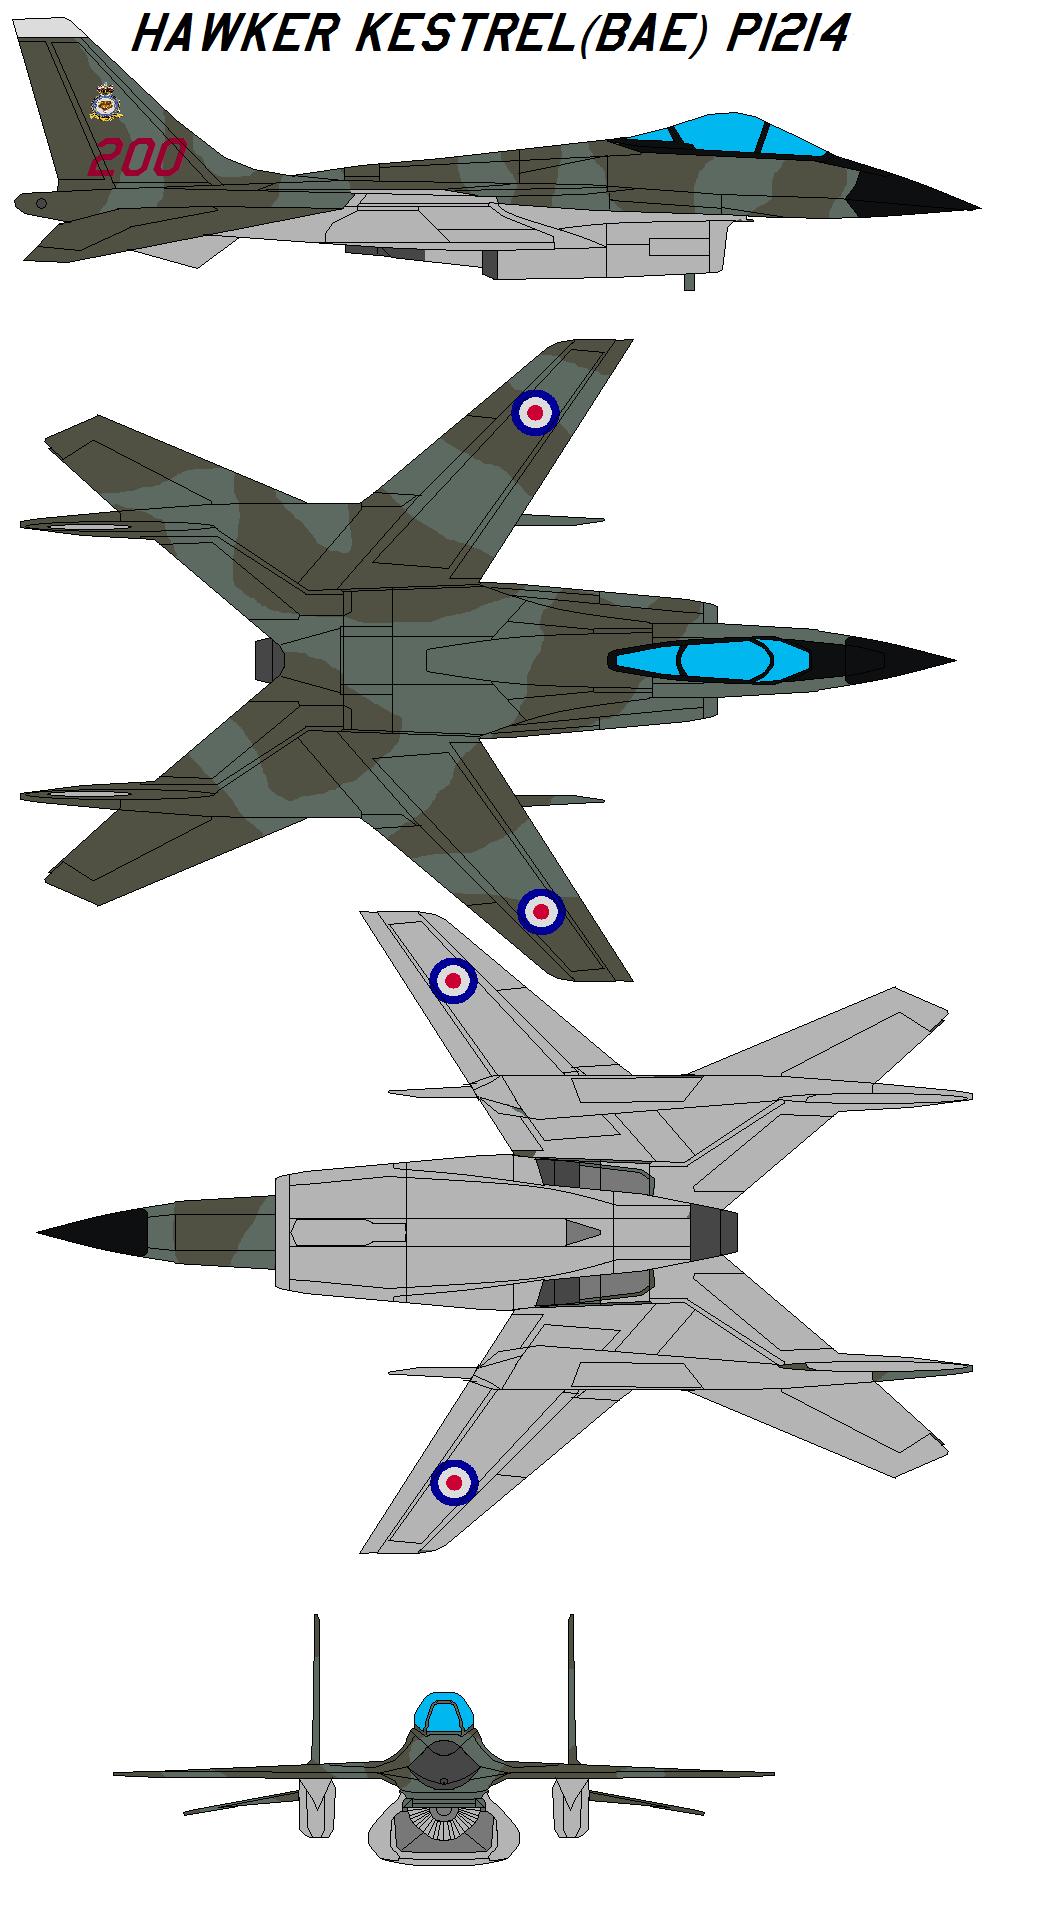 Hawker Kestrel BAe P1214 By Bagera3005 On DeviantArt